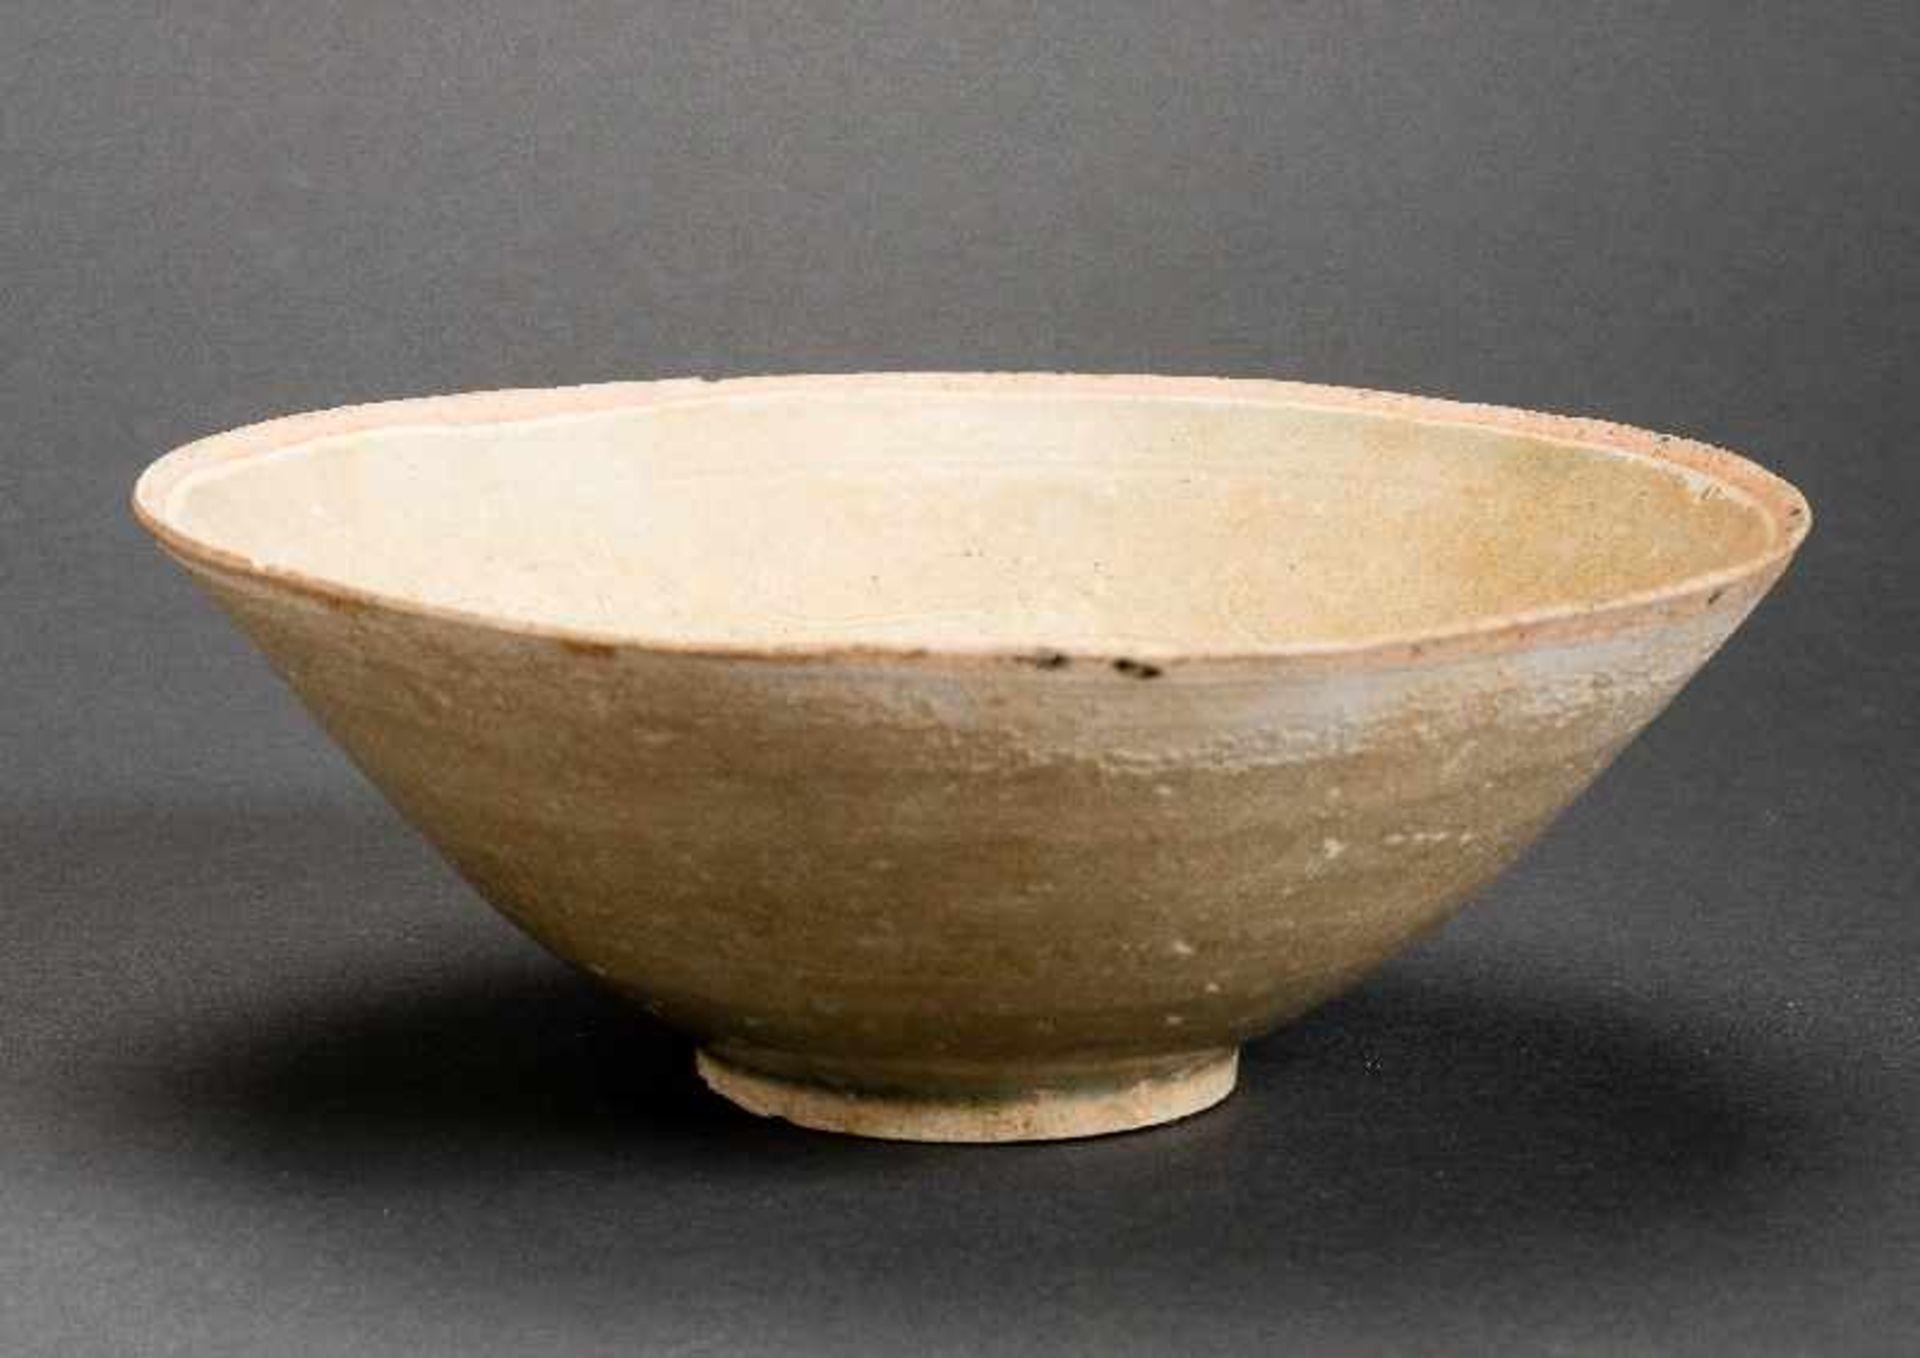 TIEFE SCHALEGlasierte Keramik. China, Song, ca. 12. bis 13. Jh. Diese trichterförmige tiefe Schale - Image 2 of 6